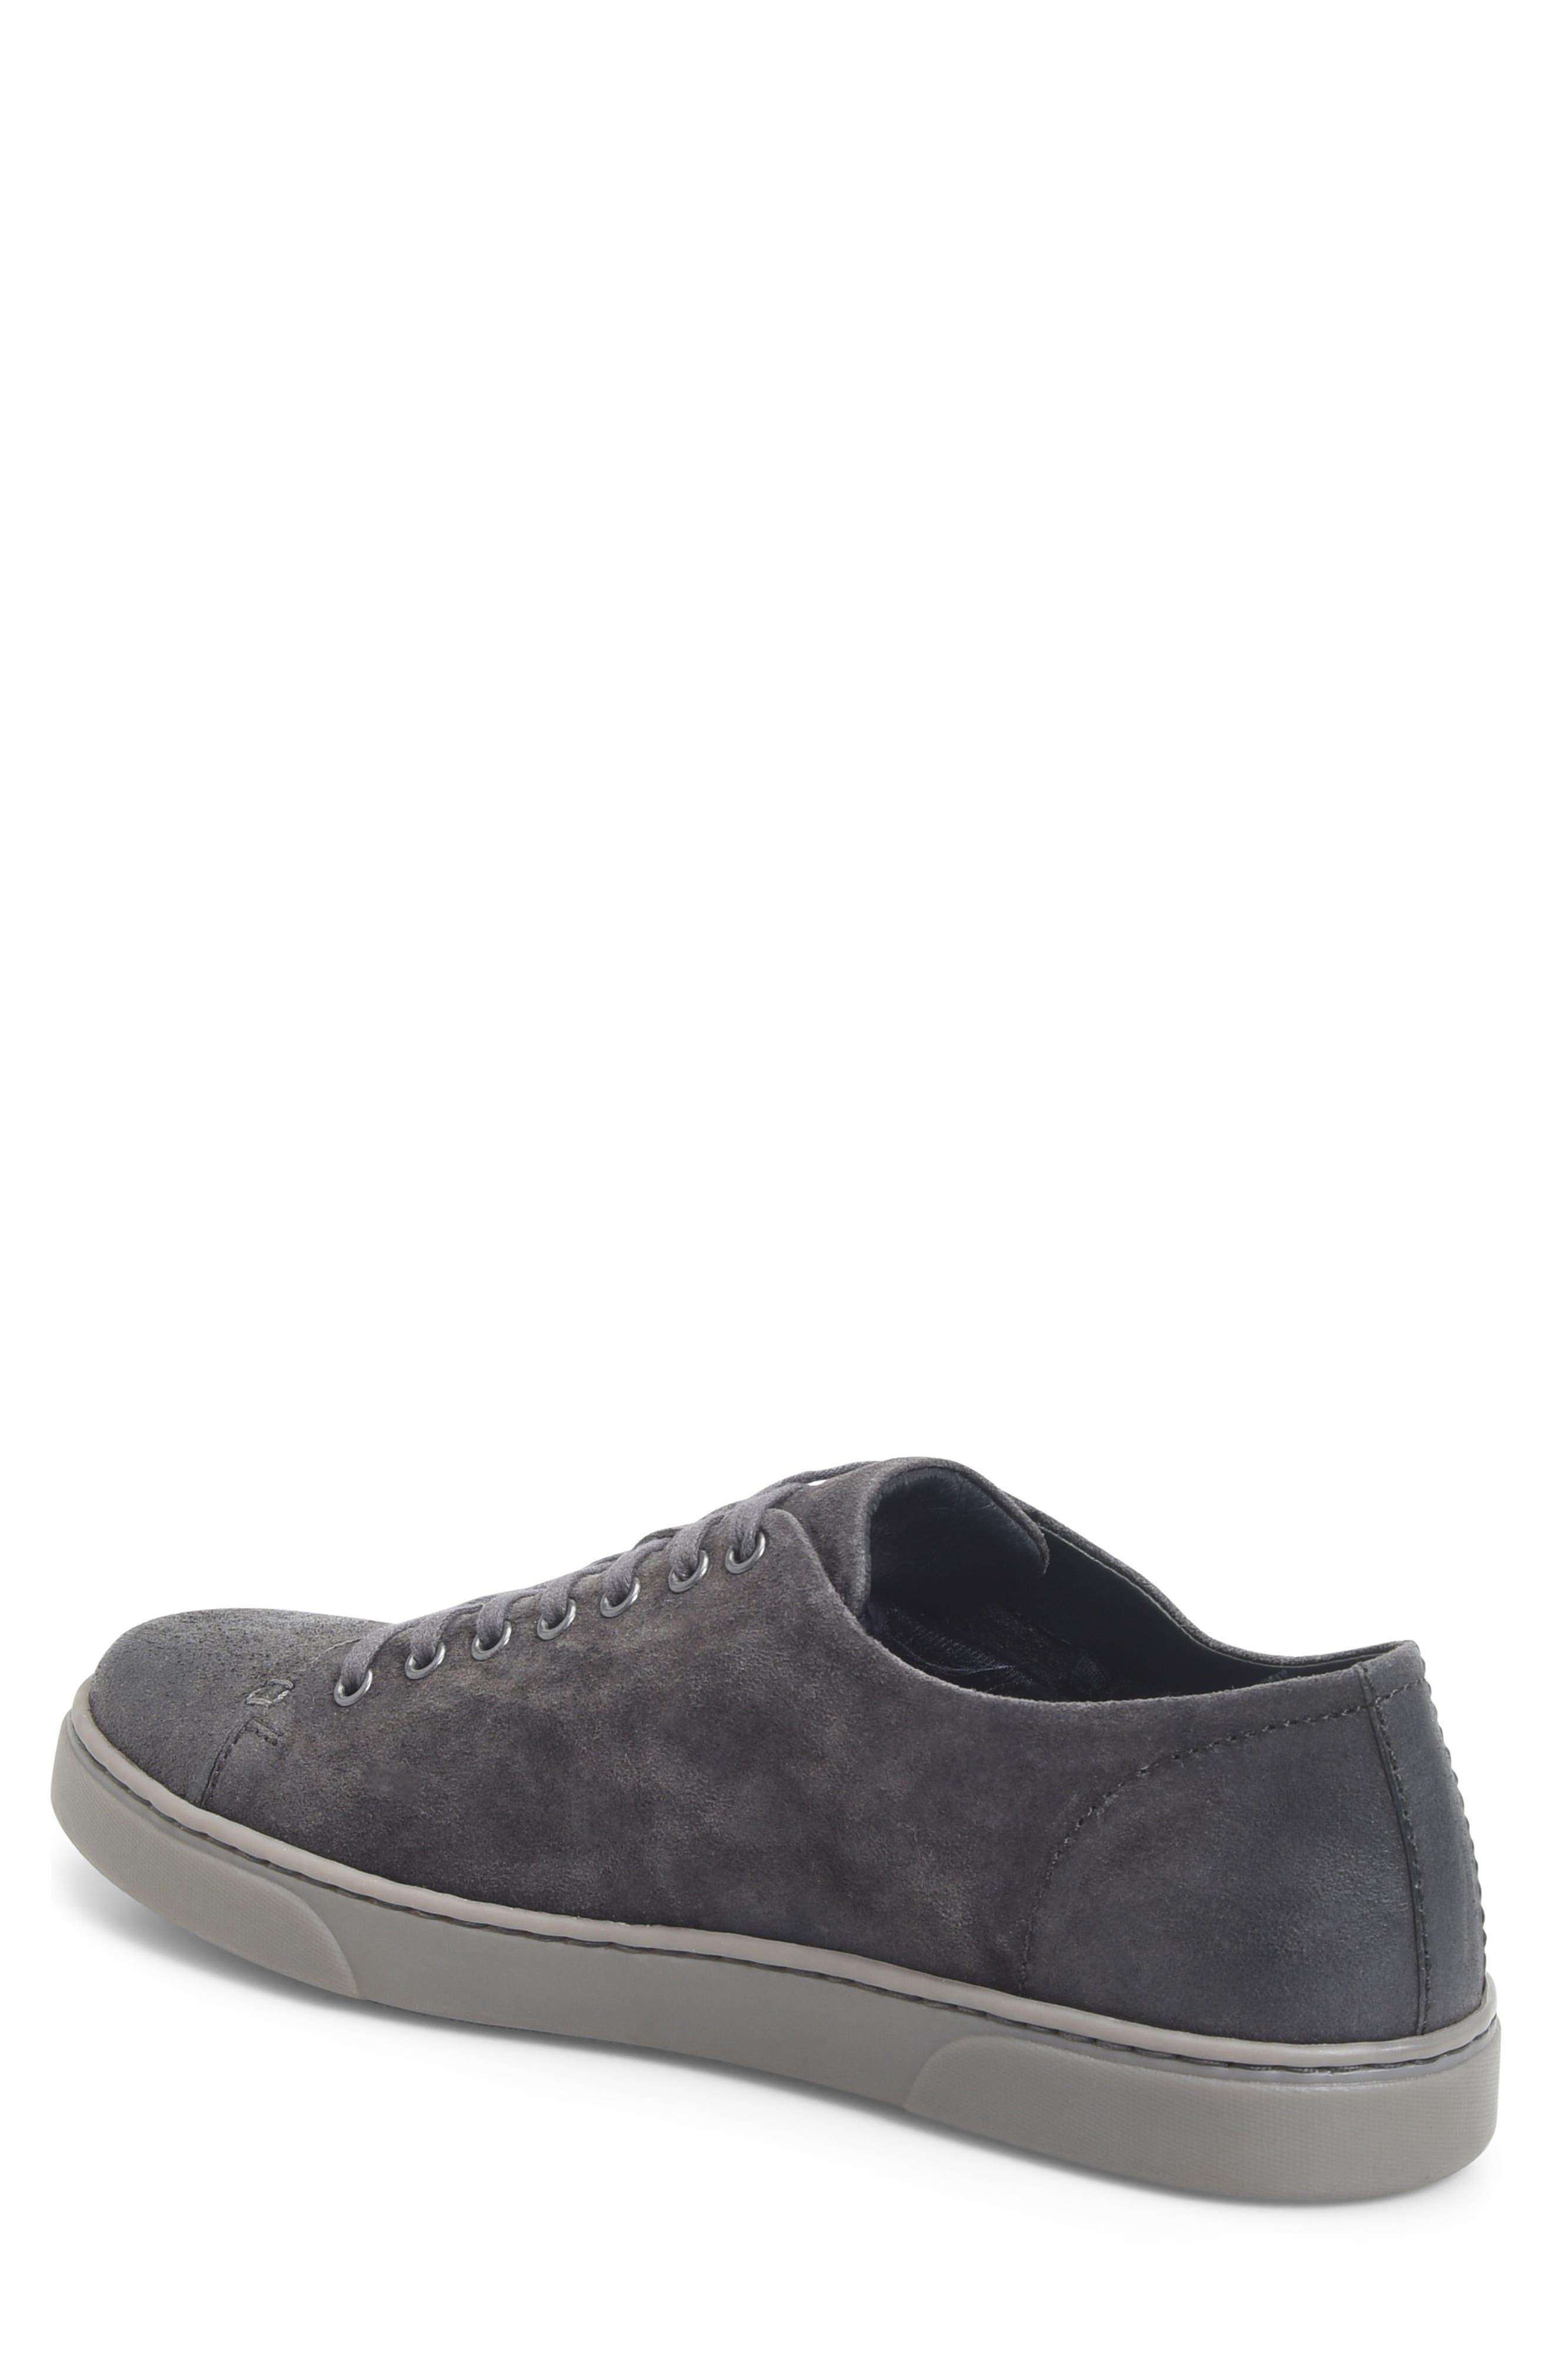 'Bayne' Cap Toe Sneaker,                             Alternate thumbnail 13, color,